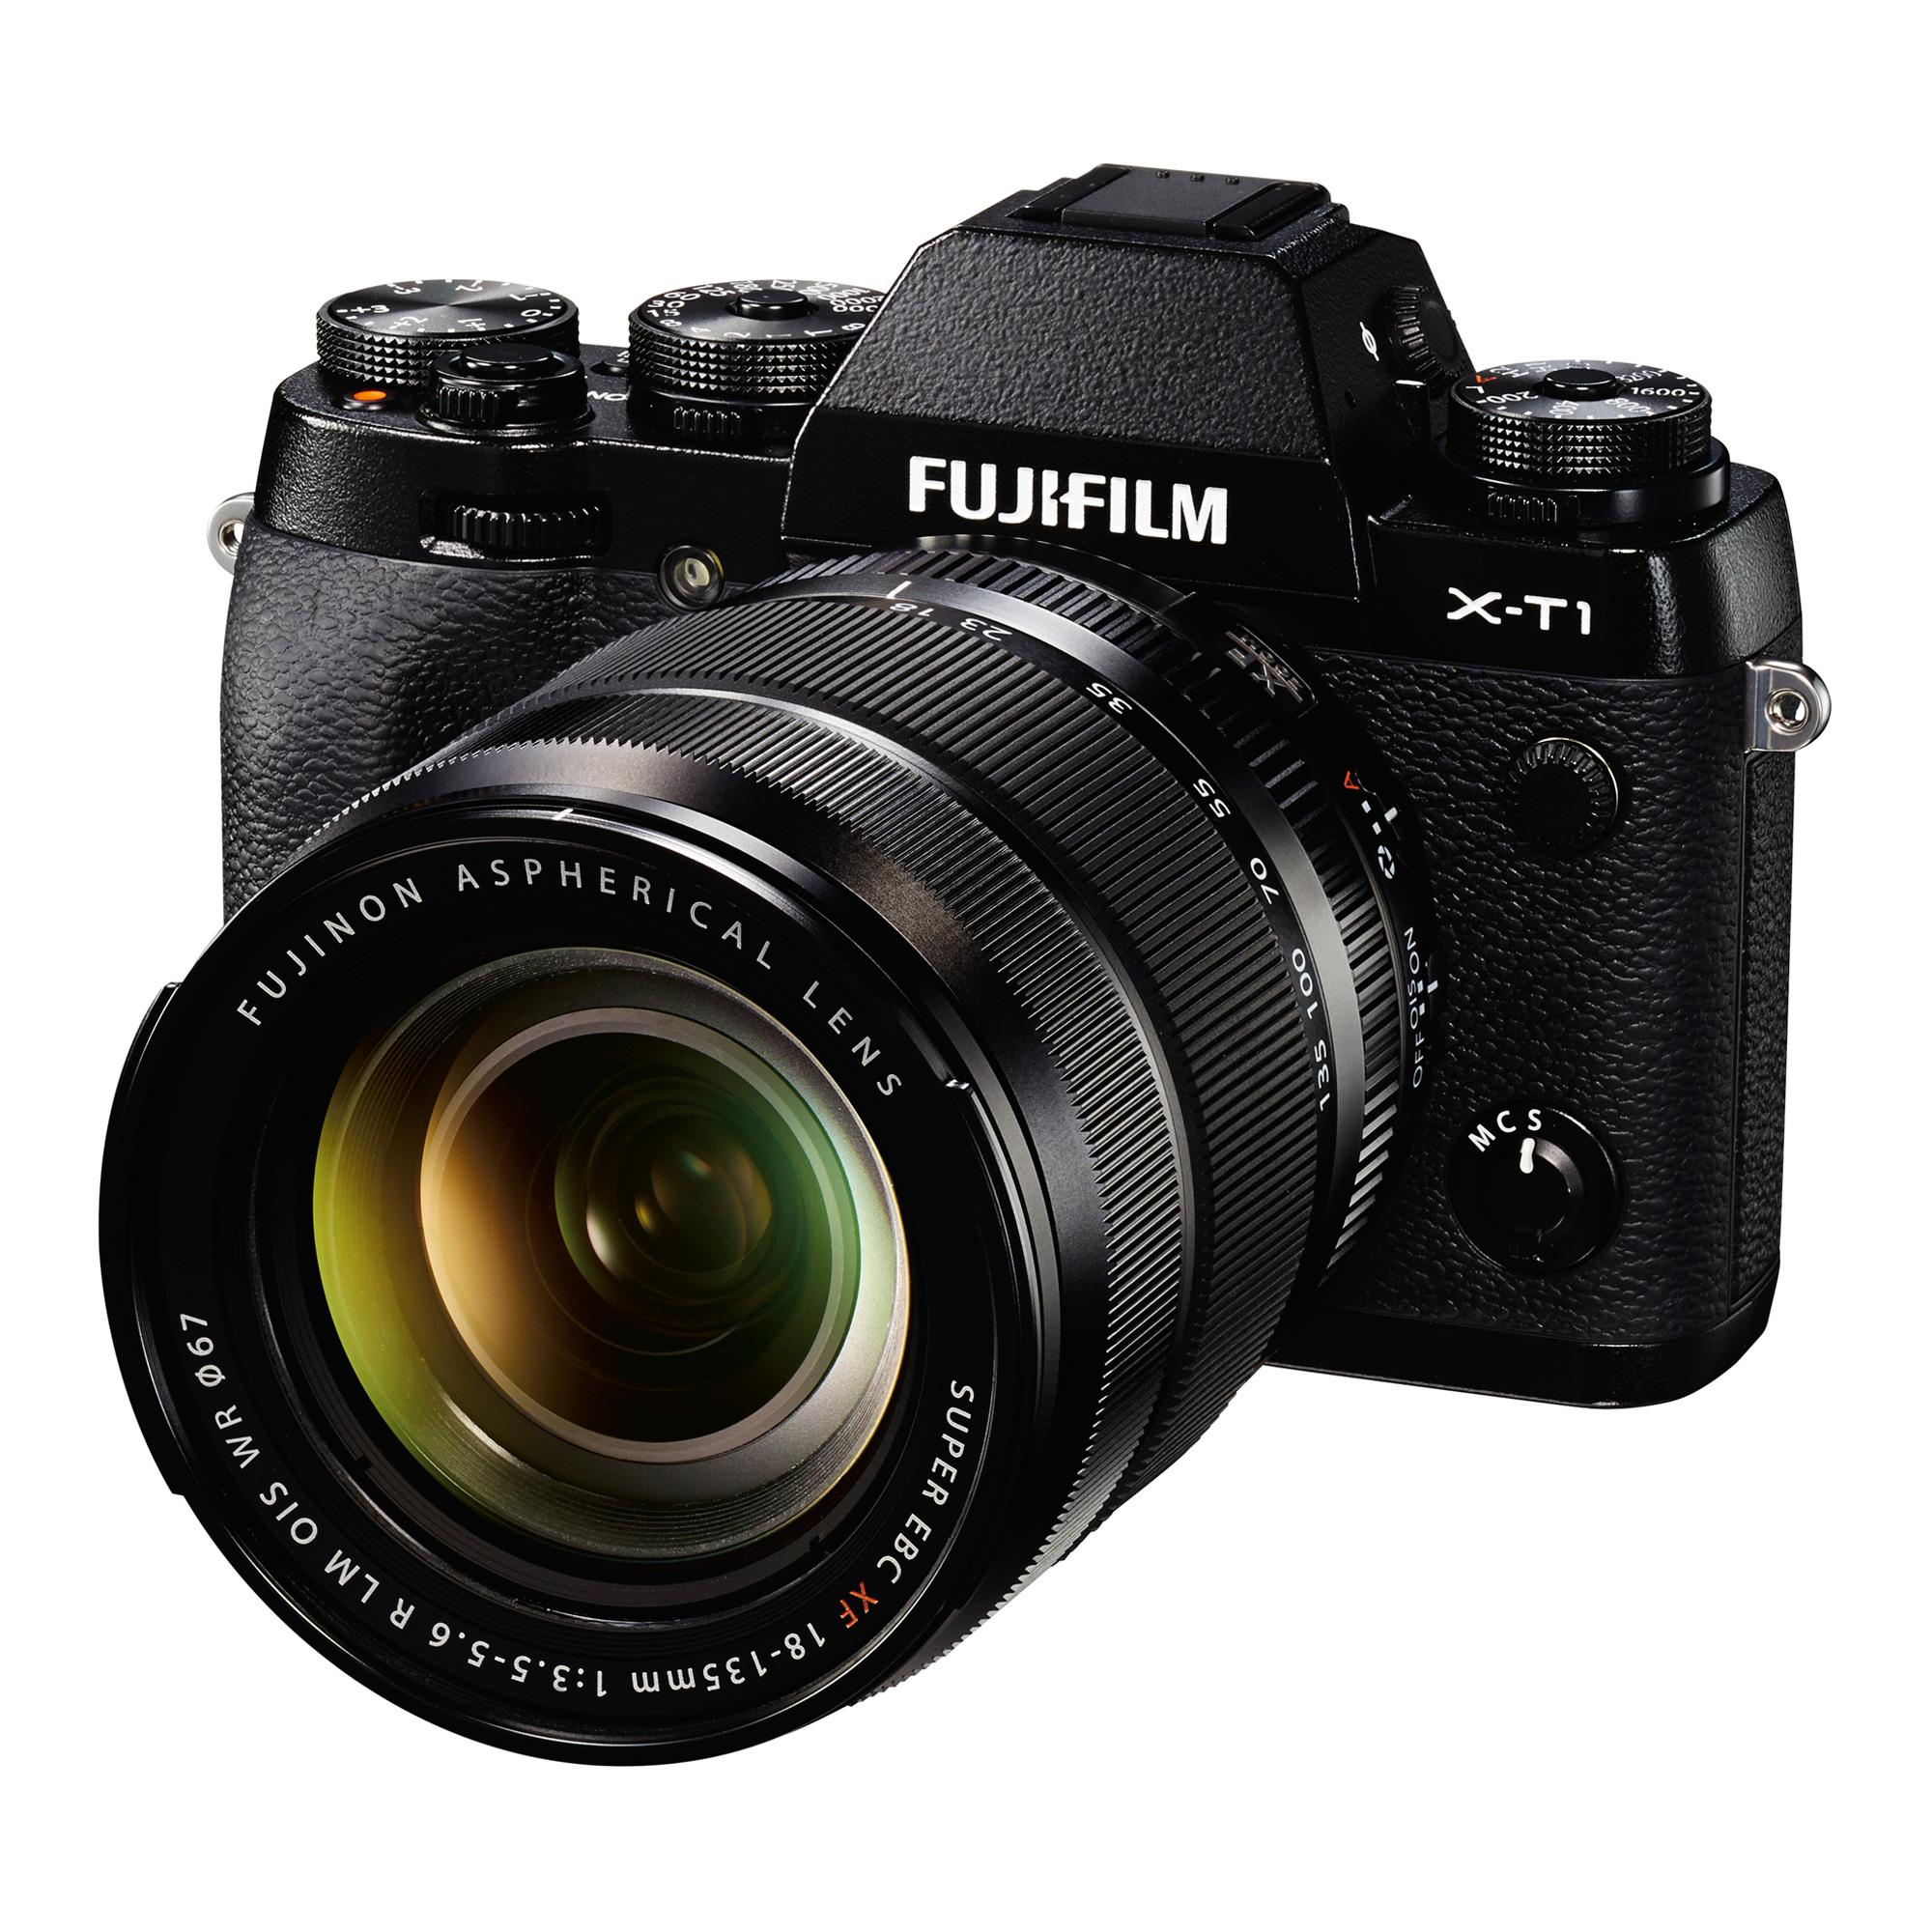 Image of Fujifilm X-T1 Mirrorless Digital Camera with 18-135mm Lens (Black)